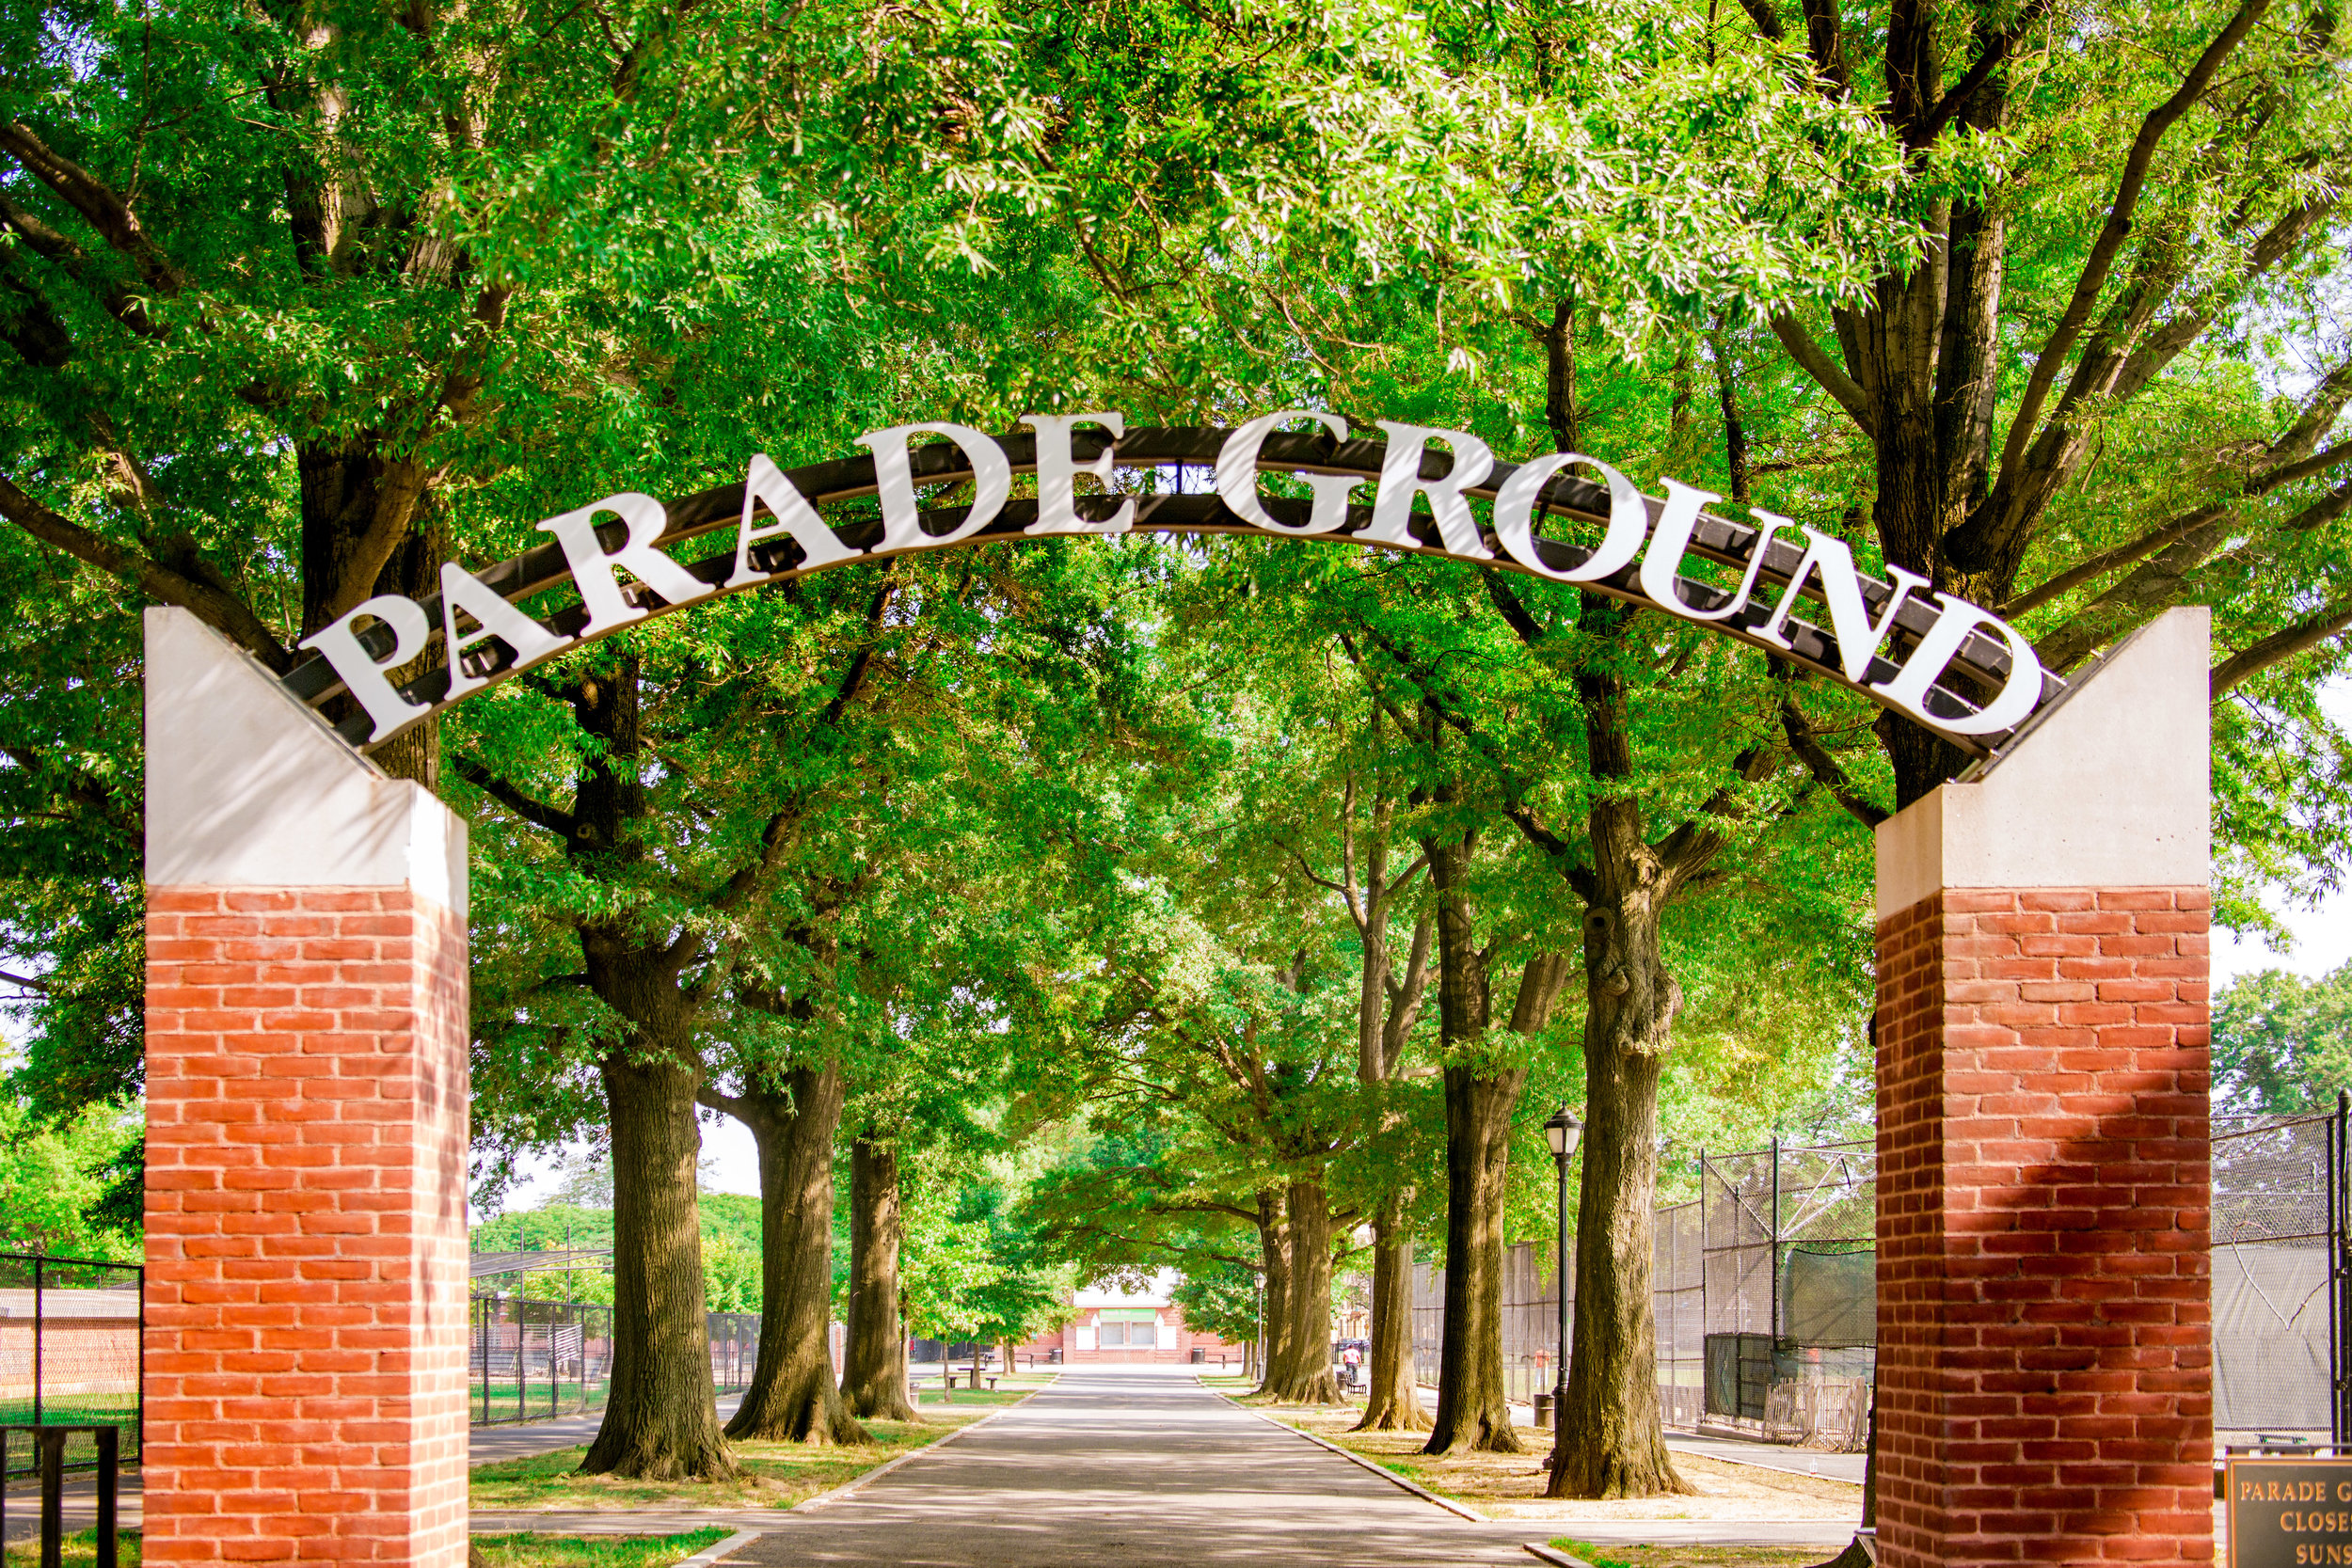 LSNY_Parade_Grounds-16.jpg